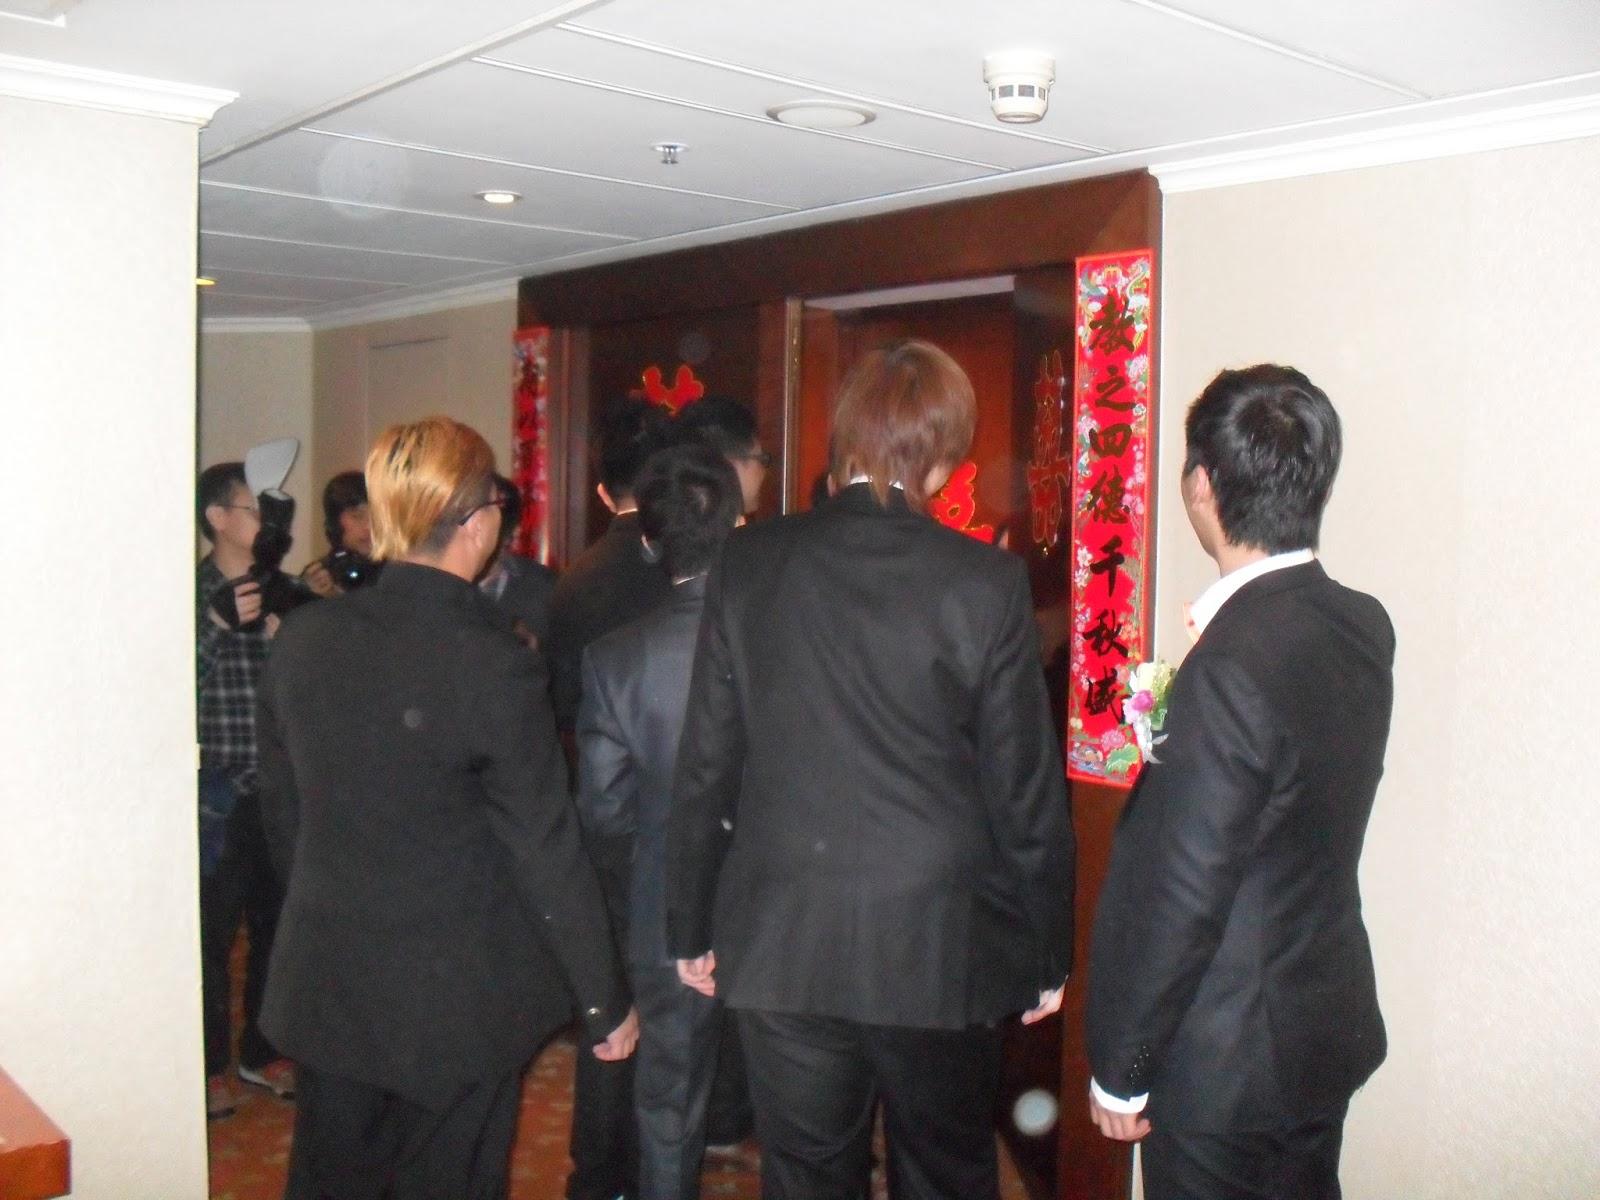 MC Andy: Wedding Planner & MC ~ Carrie & Dick Wedding on 03/03/13 ~ 金皇廷海鮮酒家 29圍